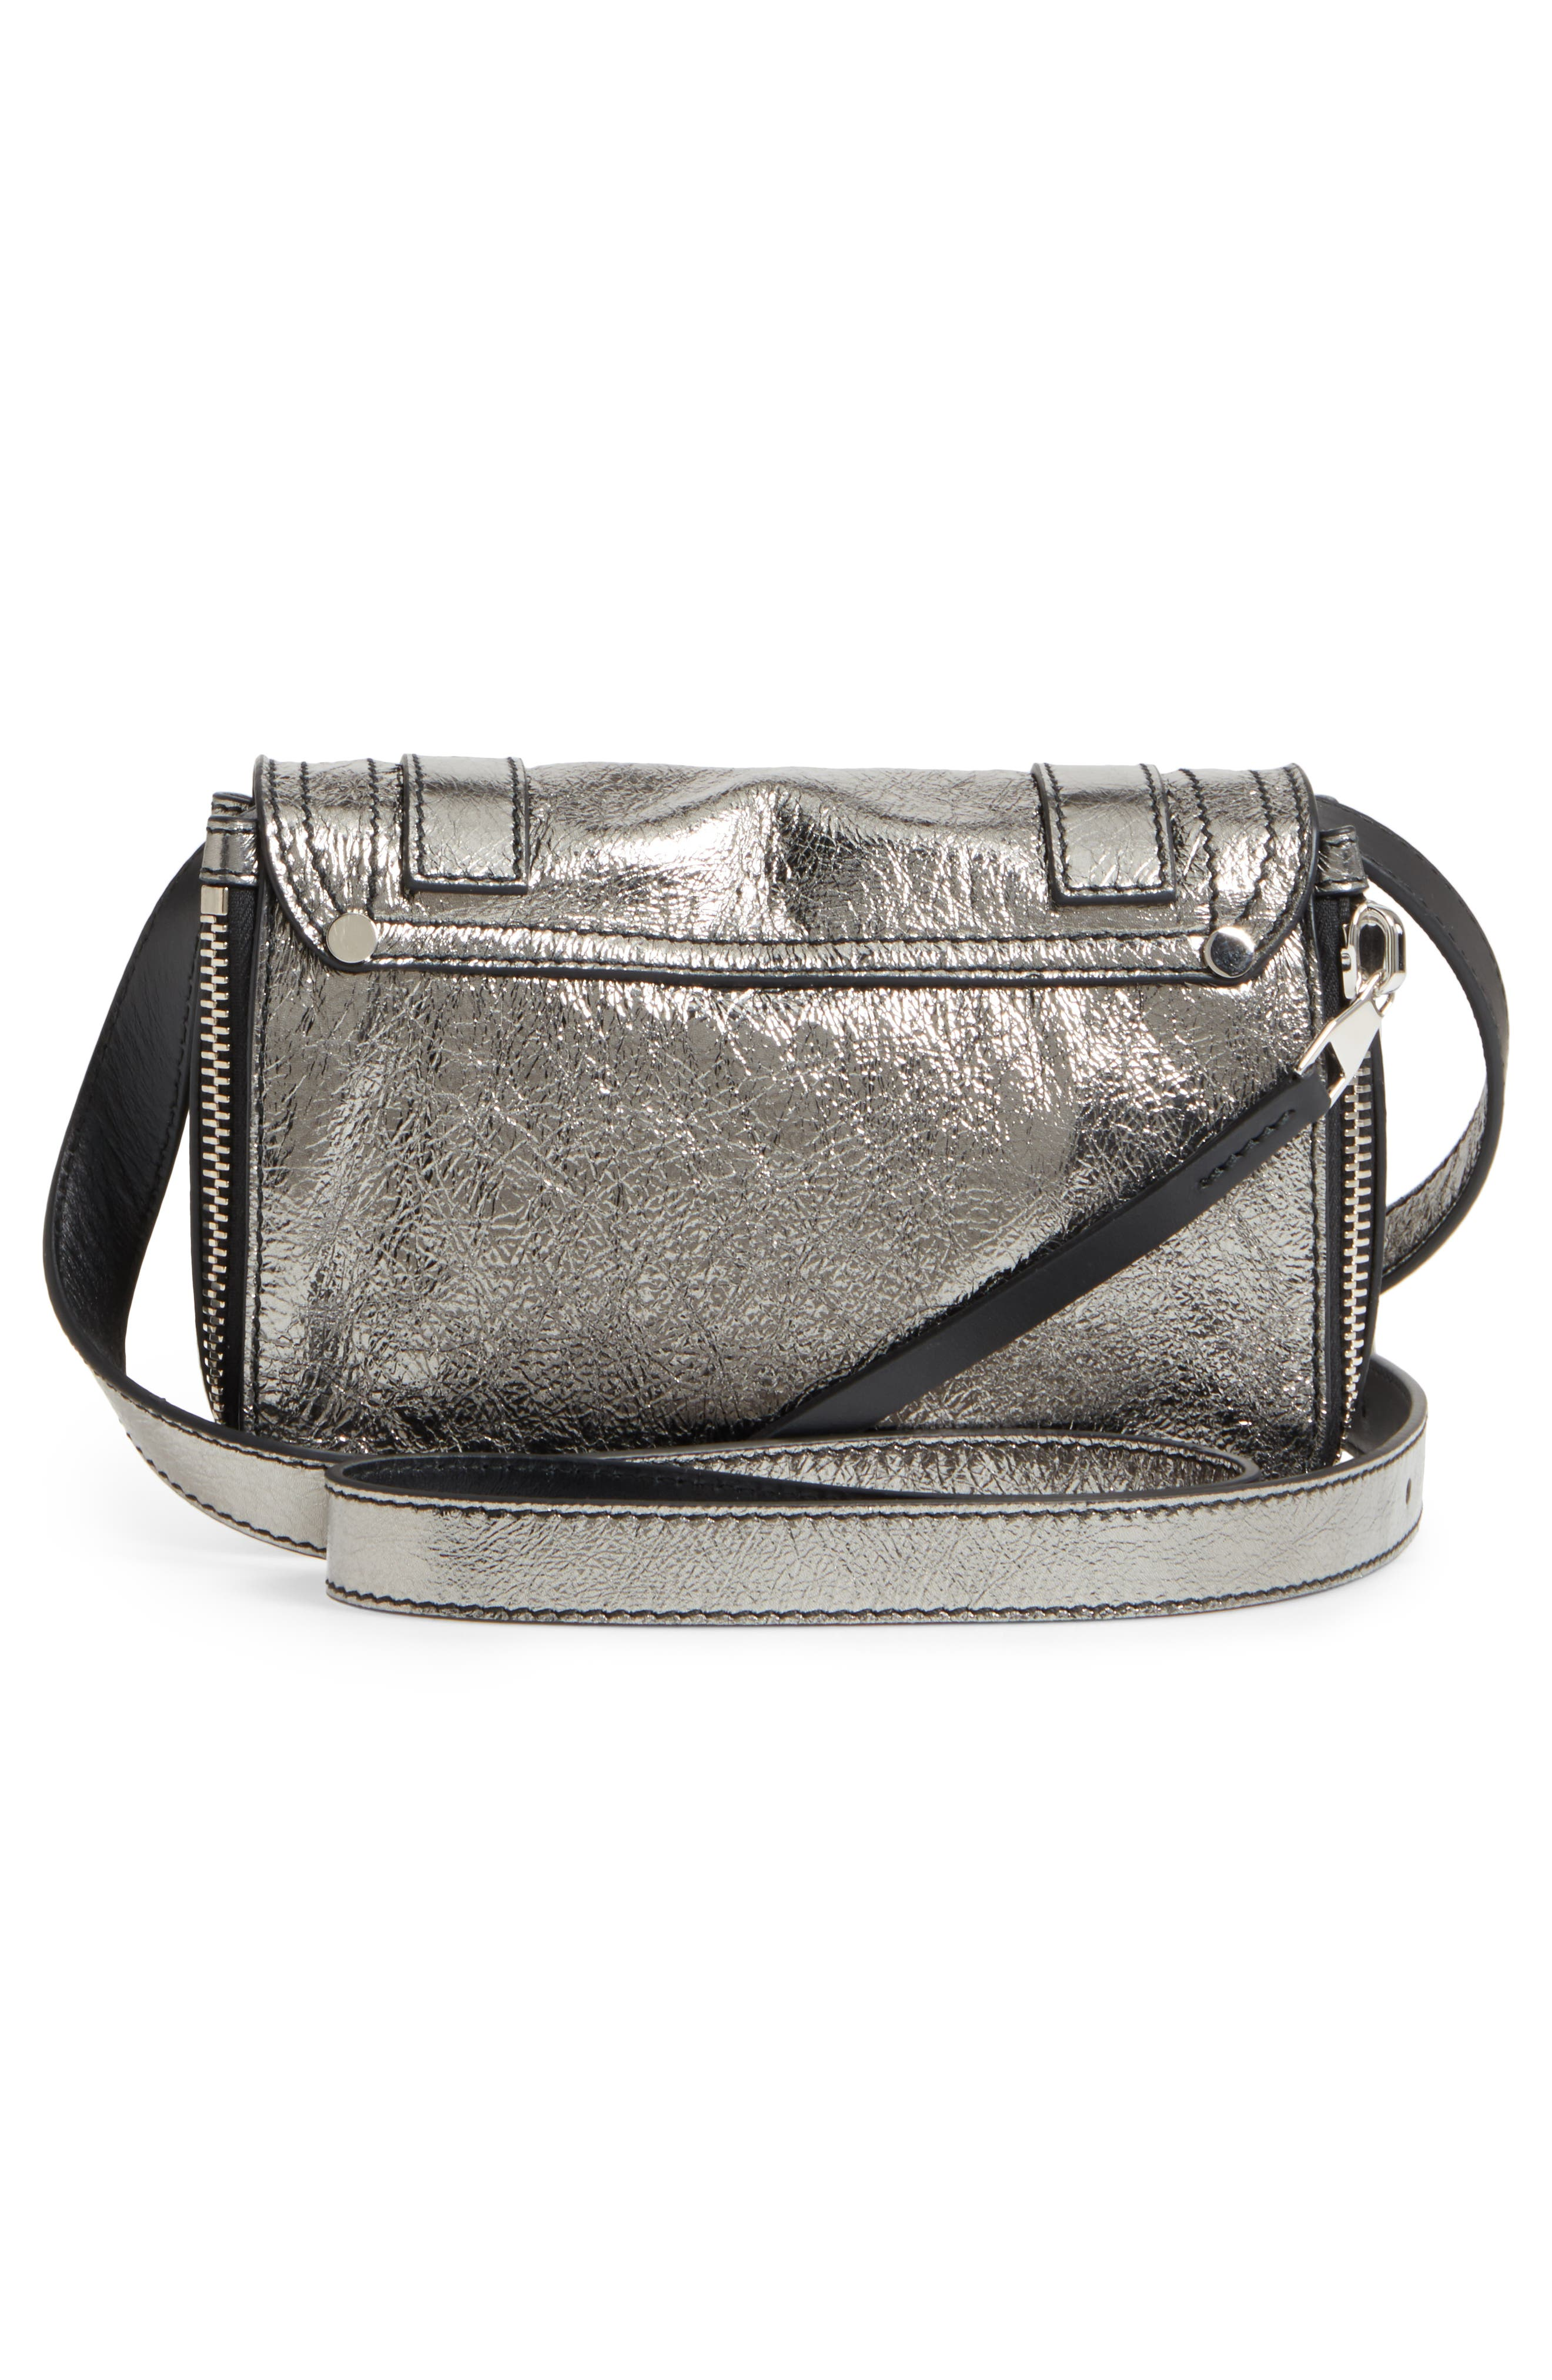 Mini PS1 Metallic Leather Crossbody Bag,                             Alternate thumbnail 3, color,                             040